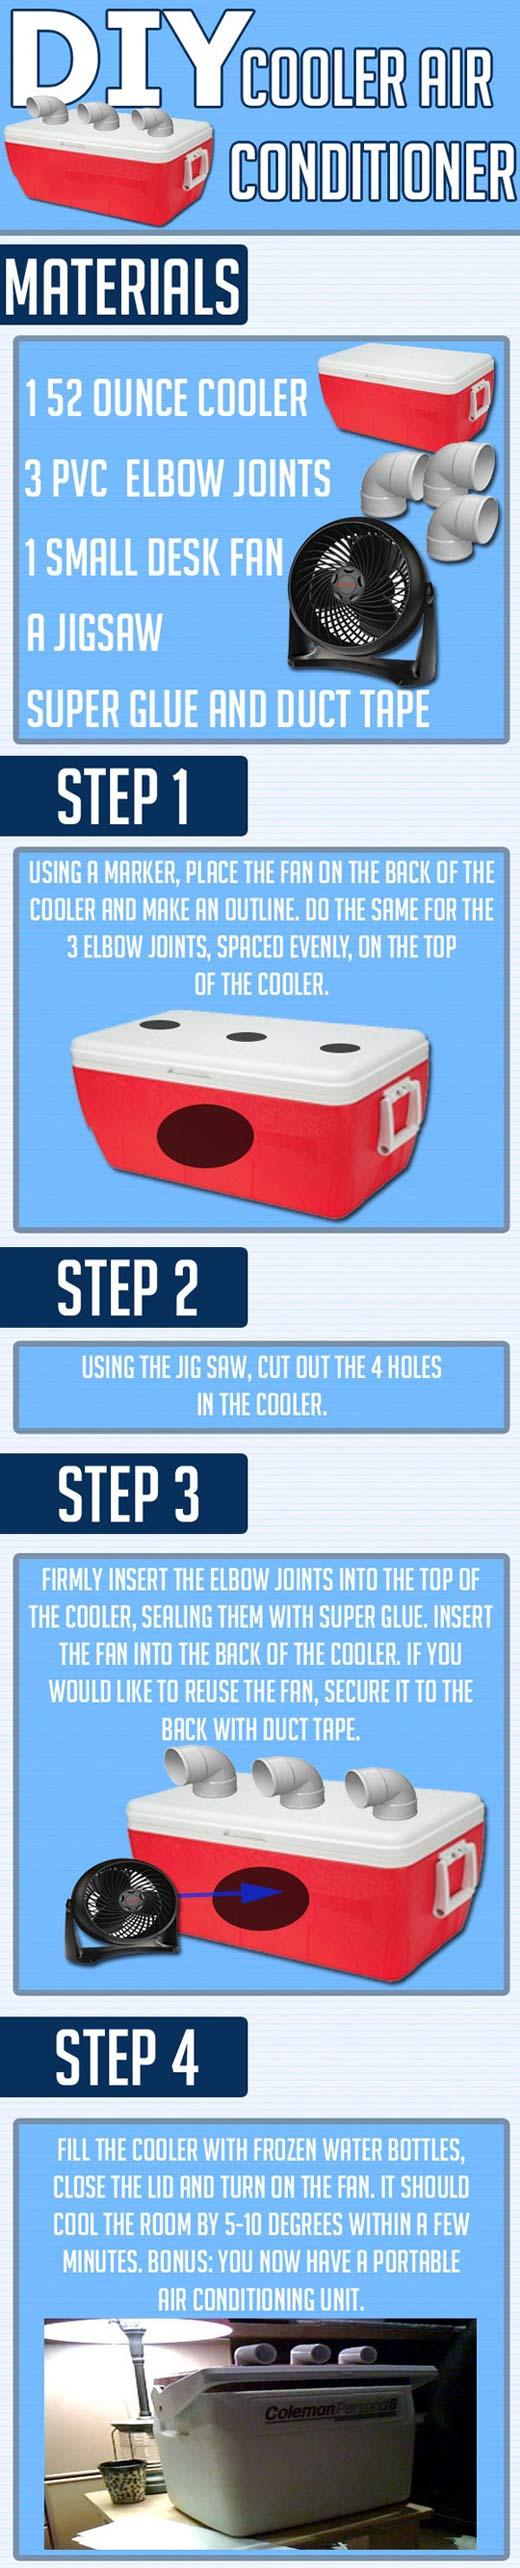 cool-DIY-cooler-air-conditioner